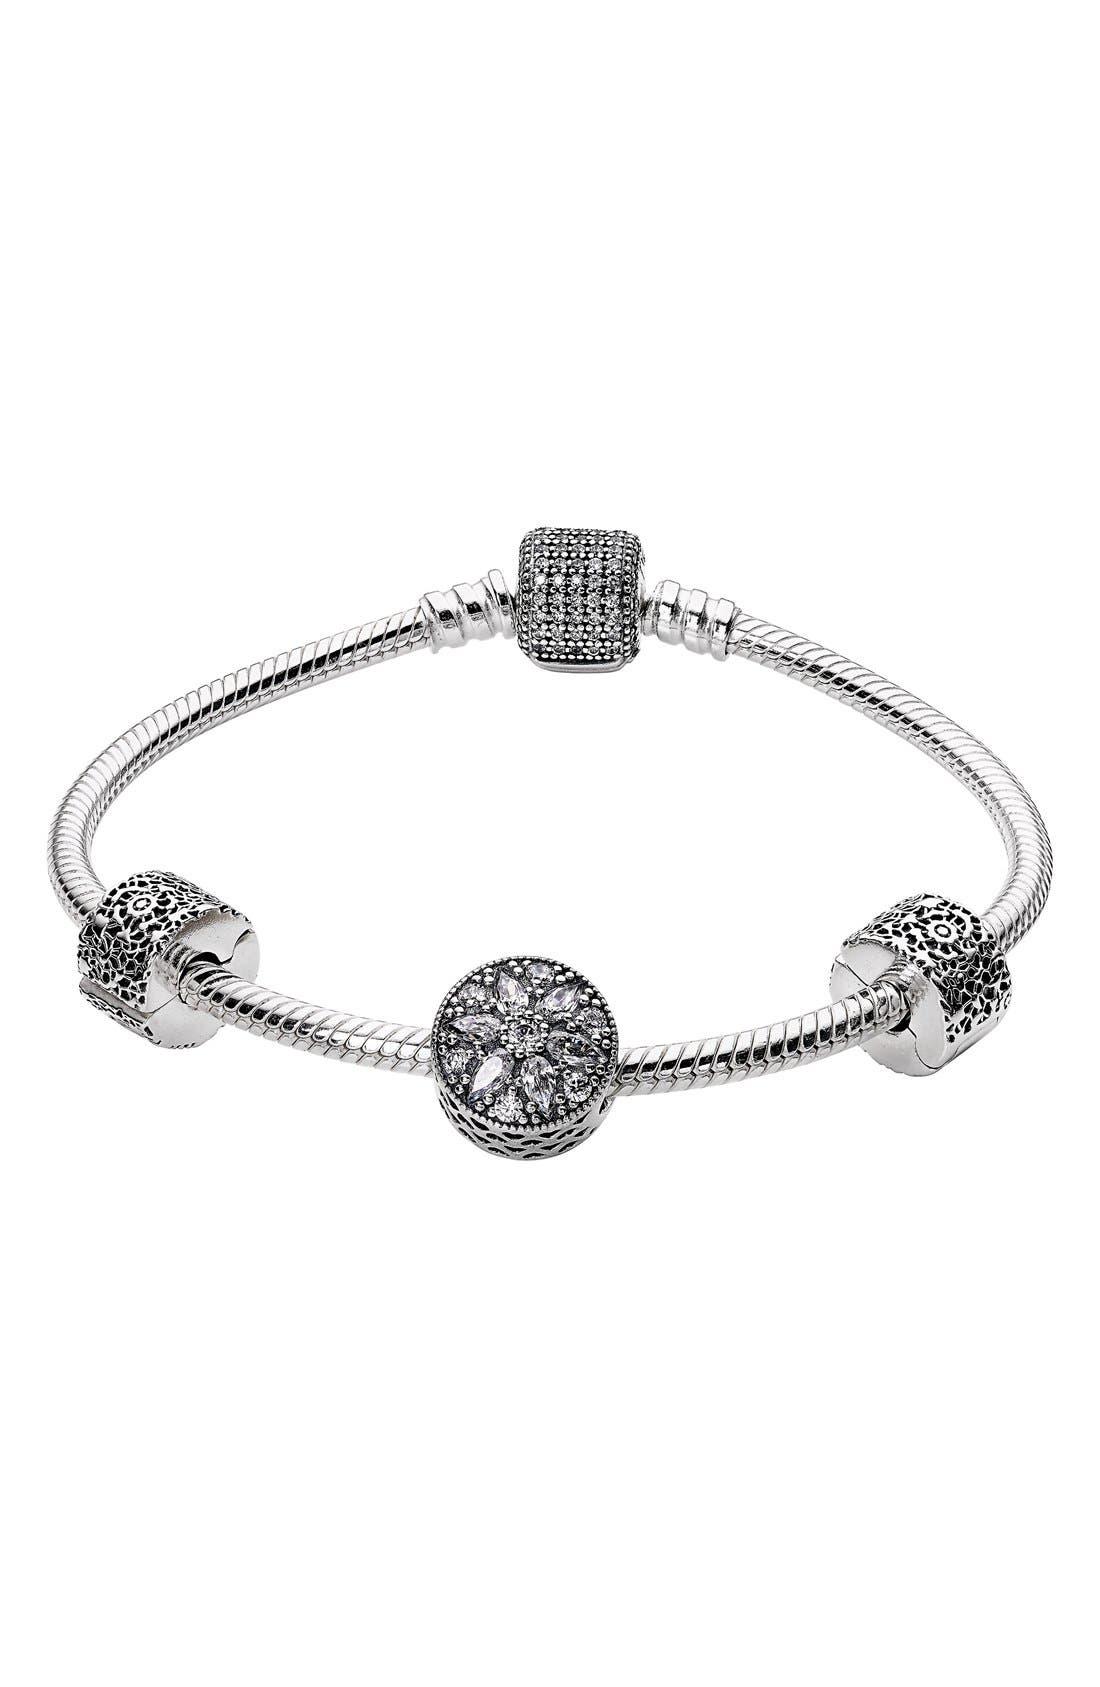 Alternate Image 1 Selected - Pandora 'Glistening Wonder' Bracelet Gift Set ($240 Value)